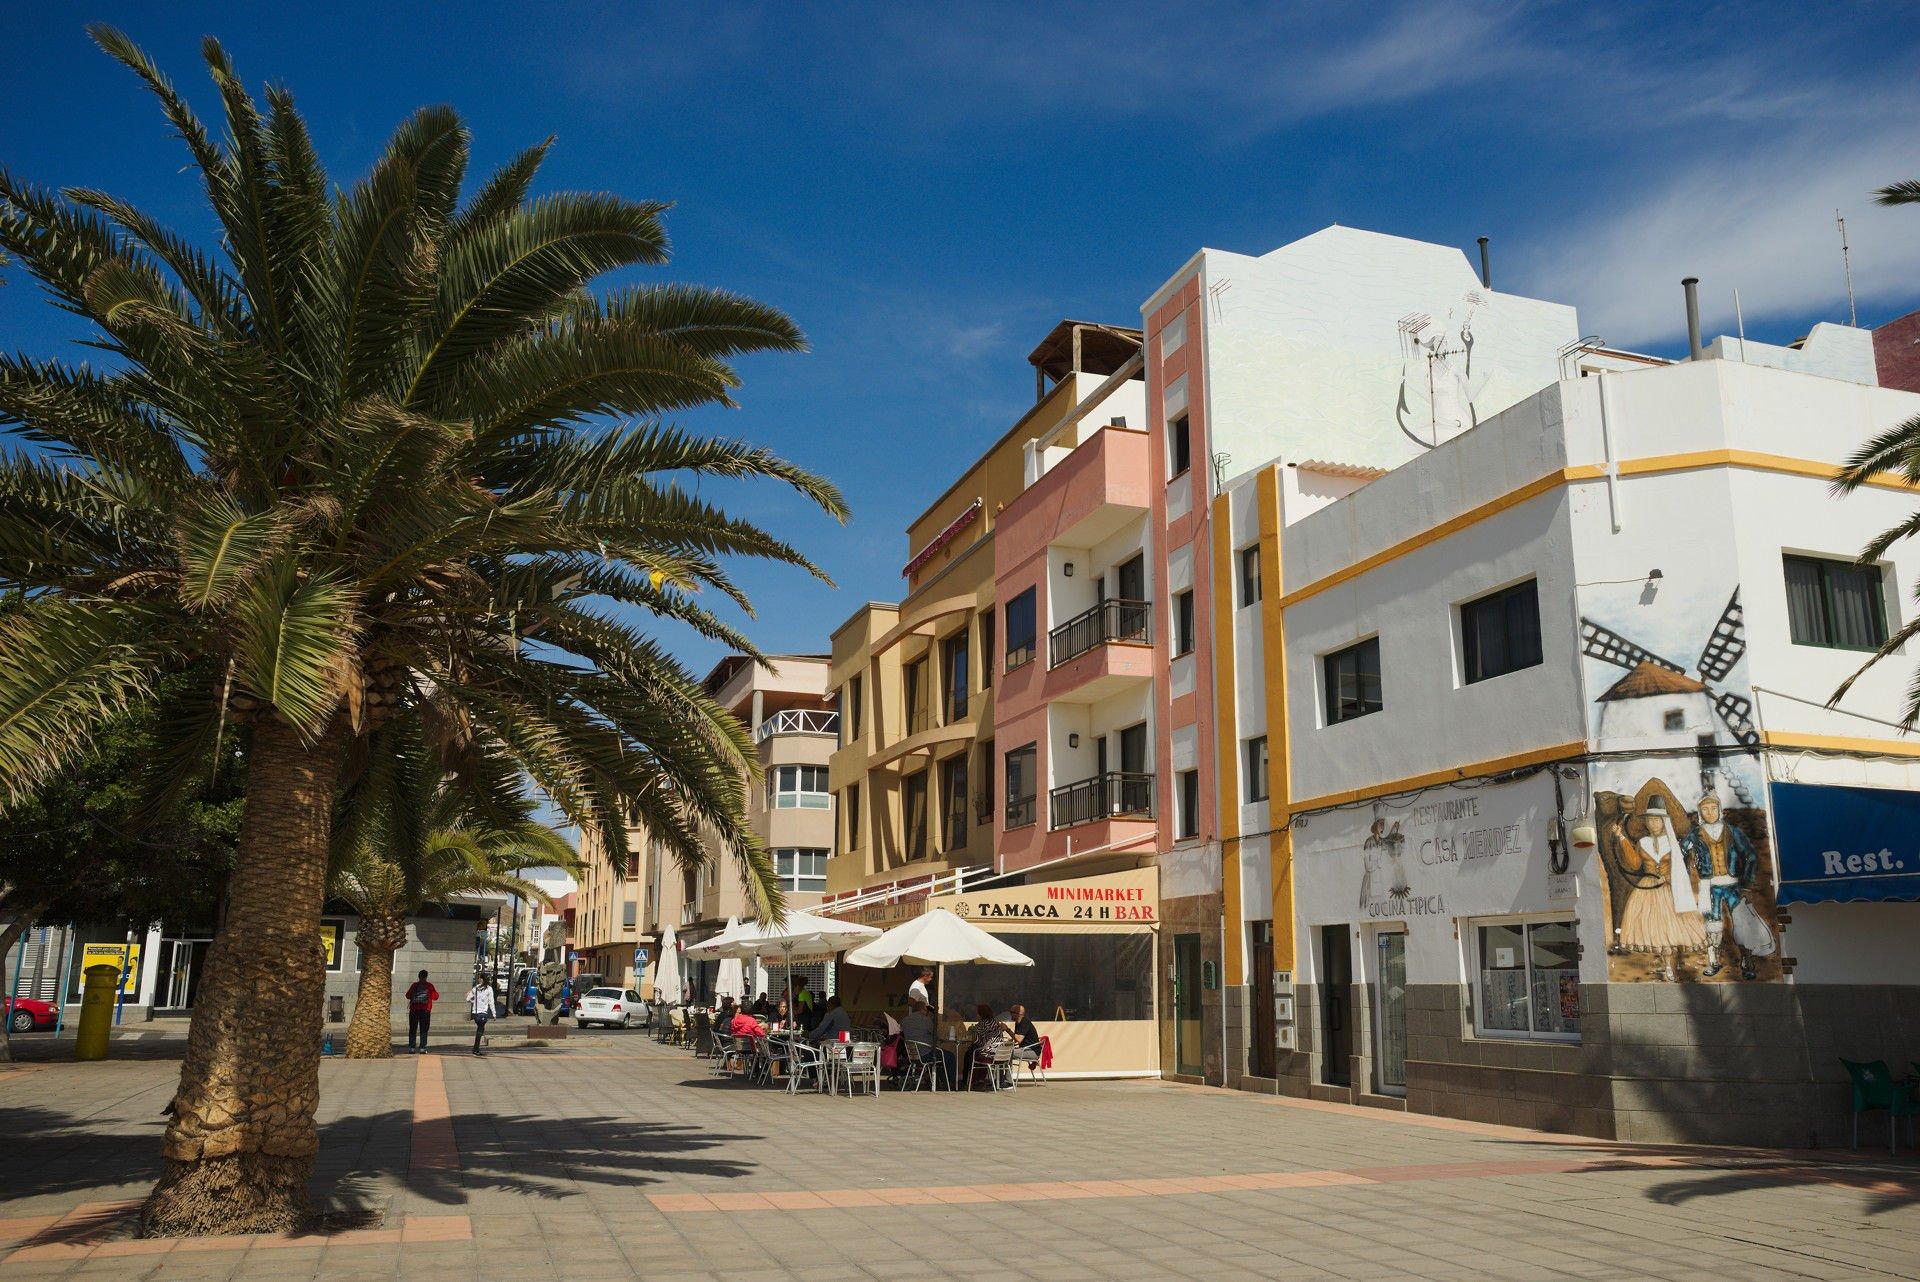 Square in Gran Tarajal, Fuerteventura